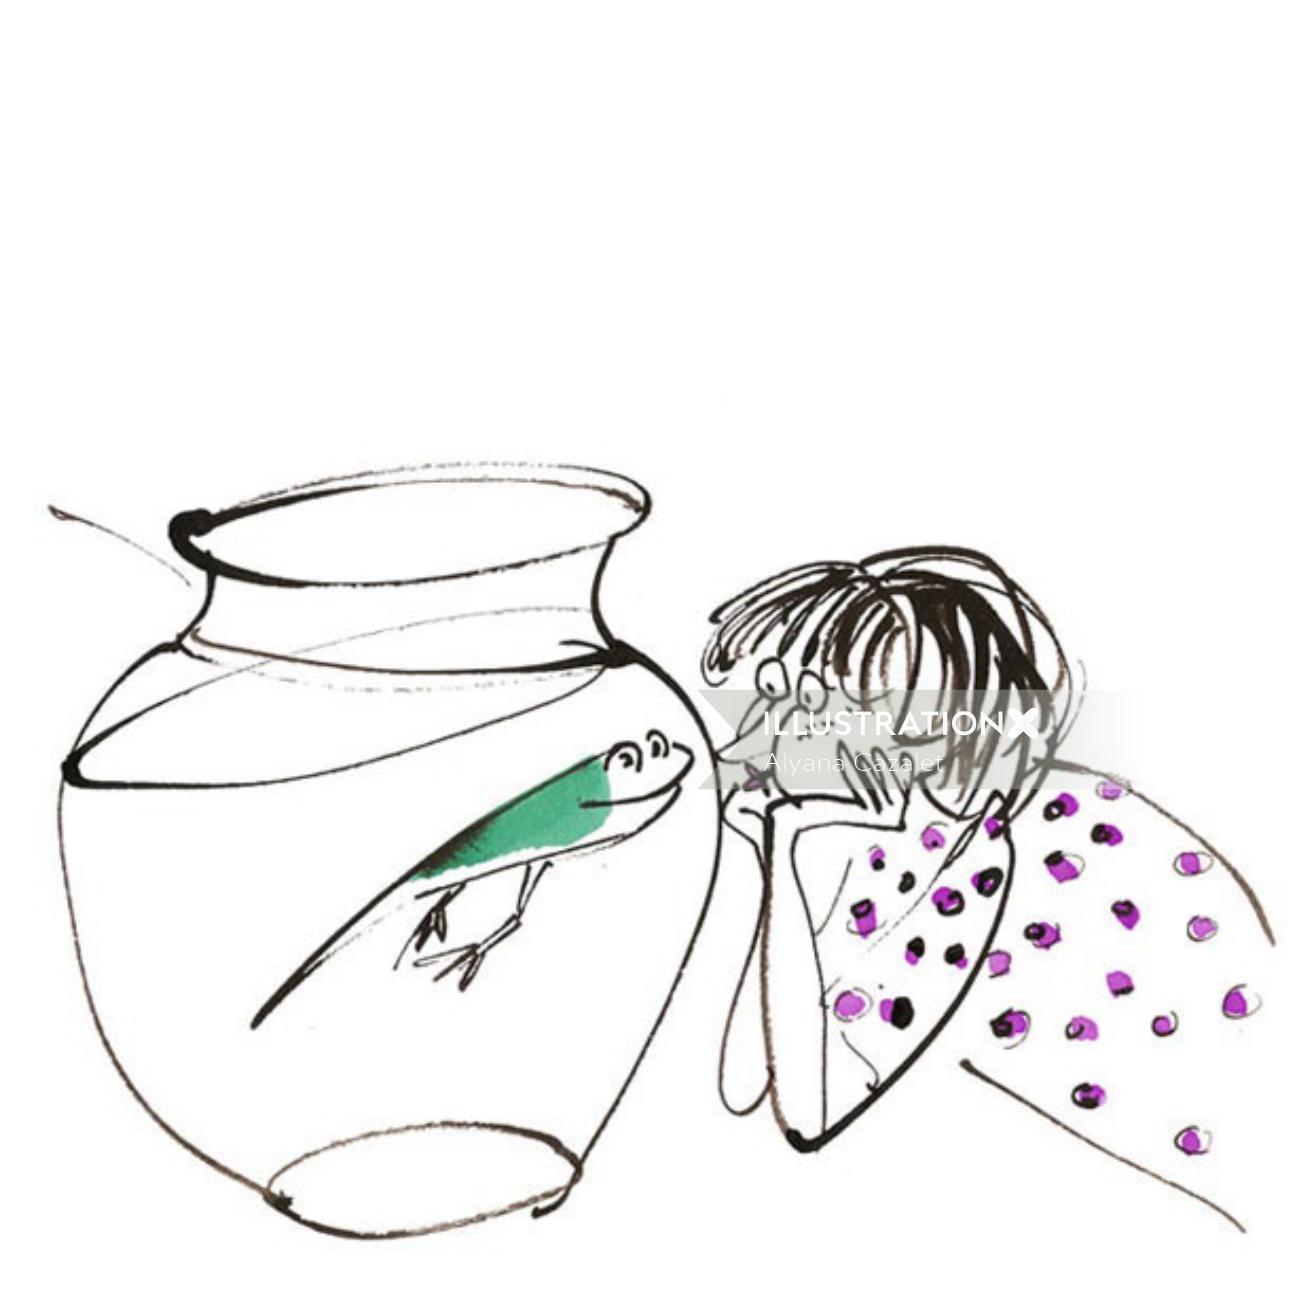 frog and girl comic illustration